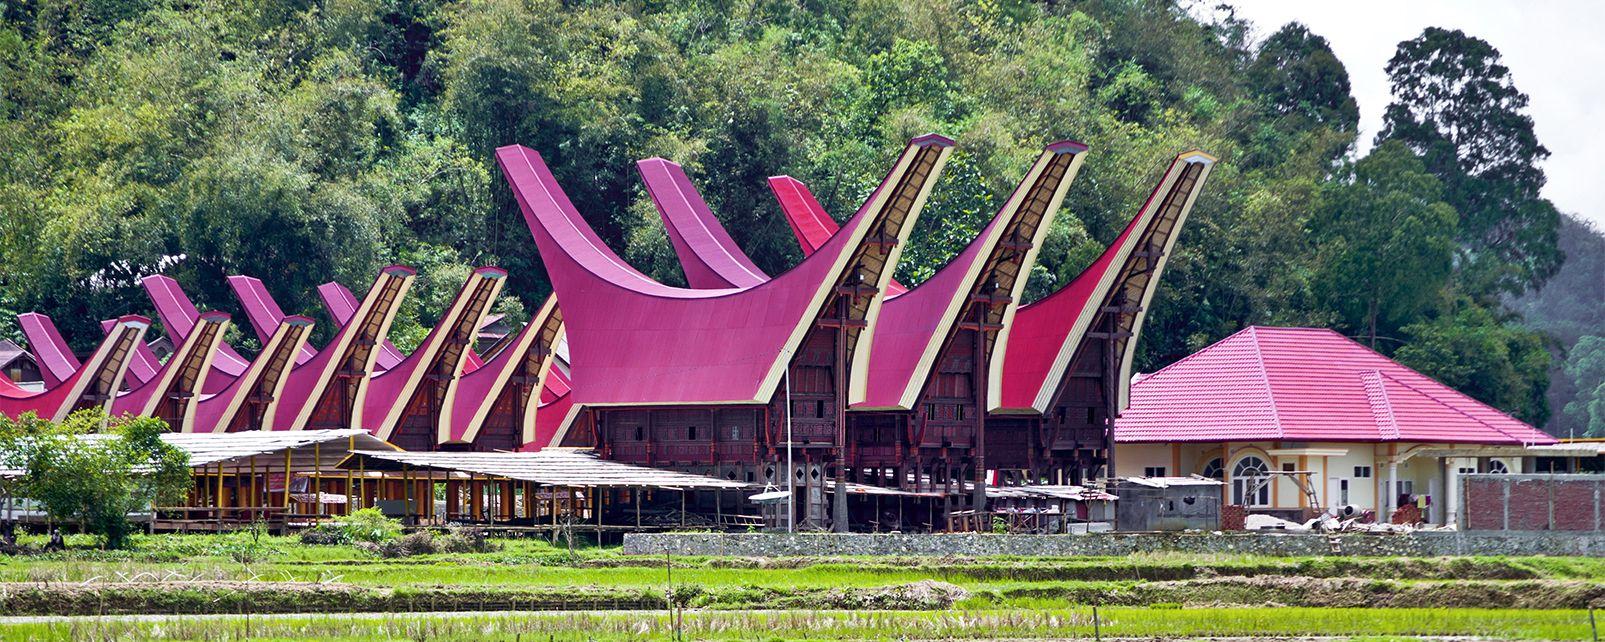 Le pays Toraja , Tana Toraja, Sulawesi, Indonésie , Indonésie